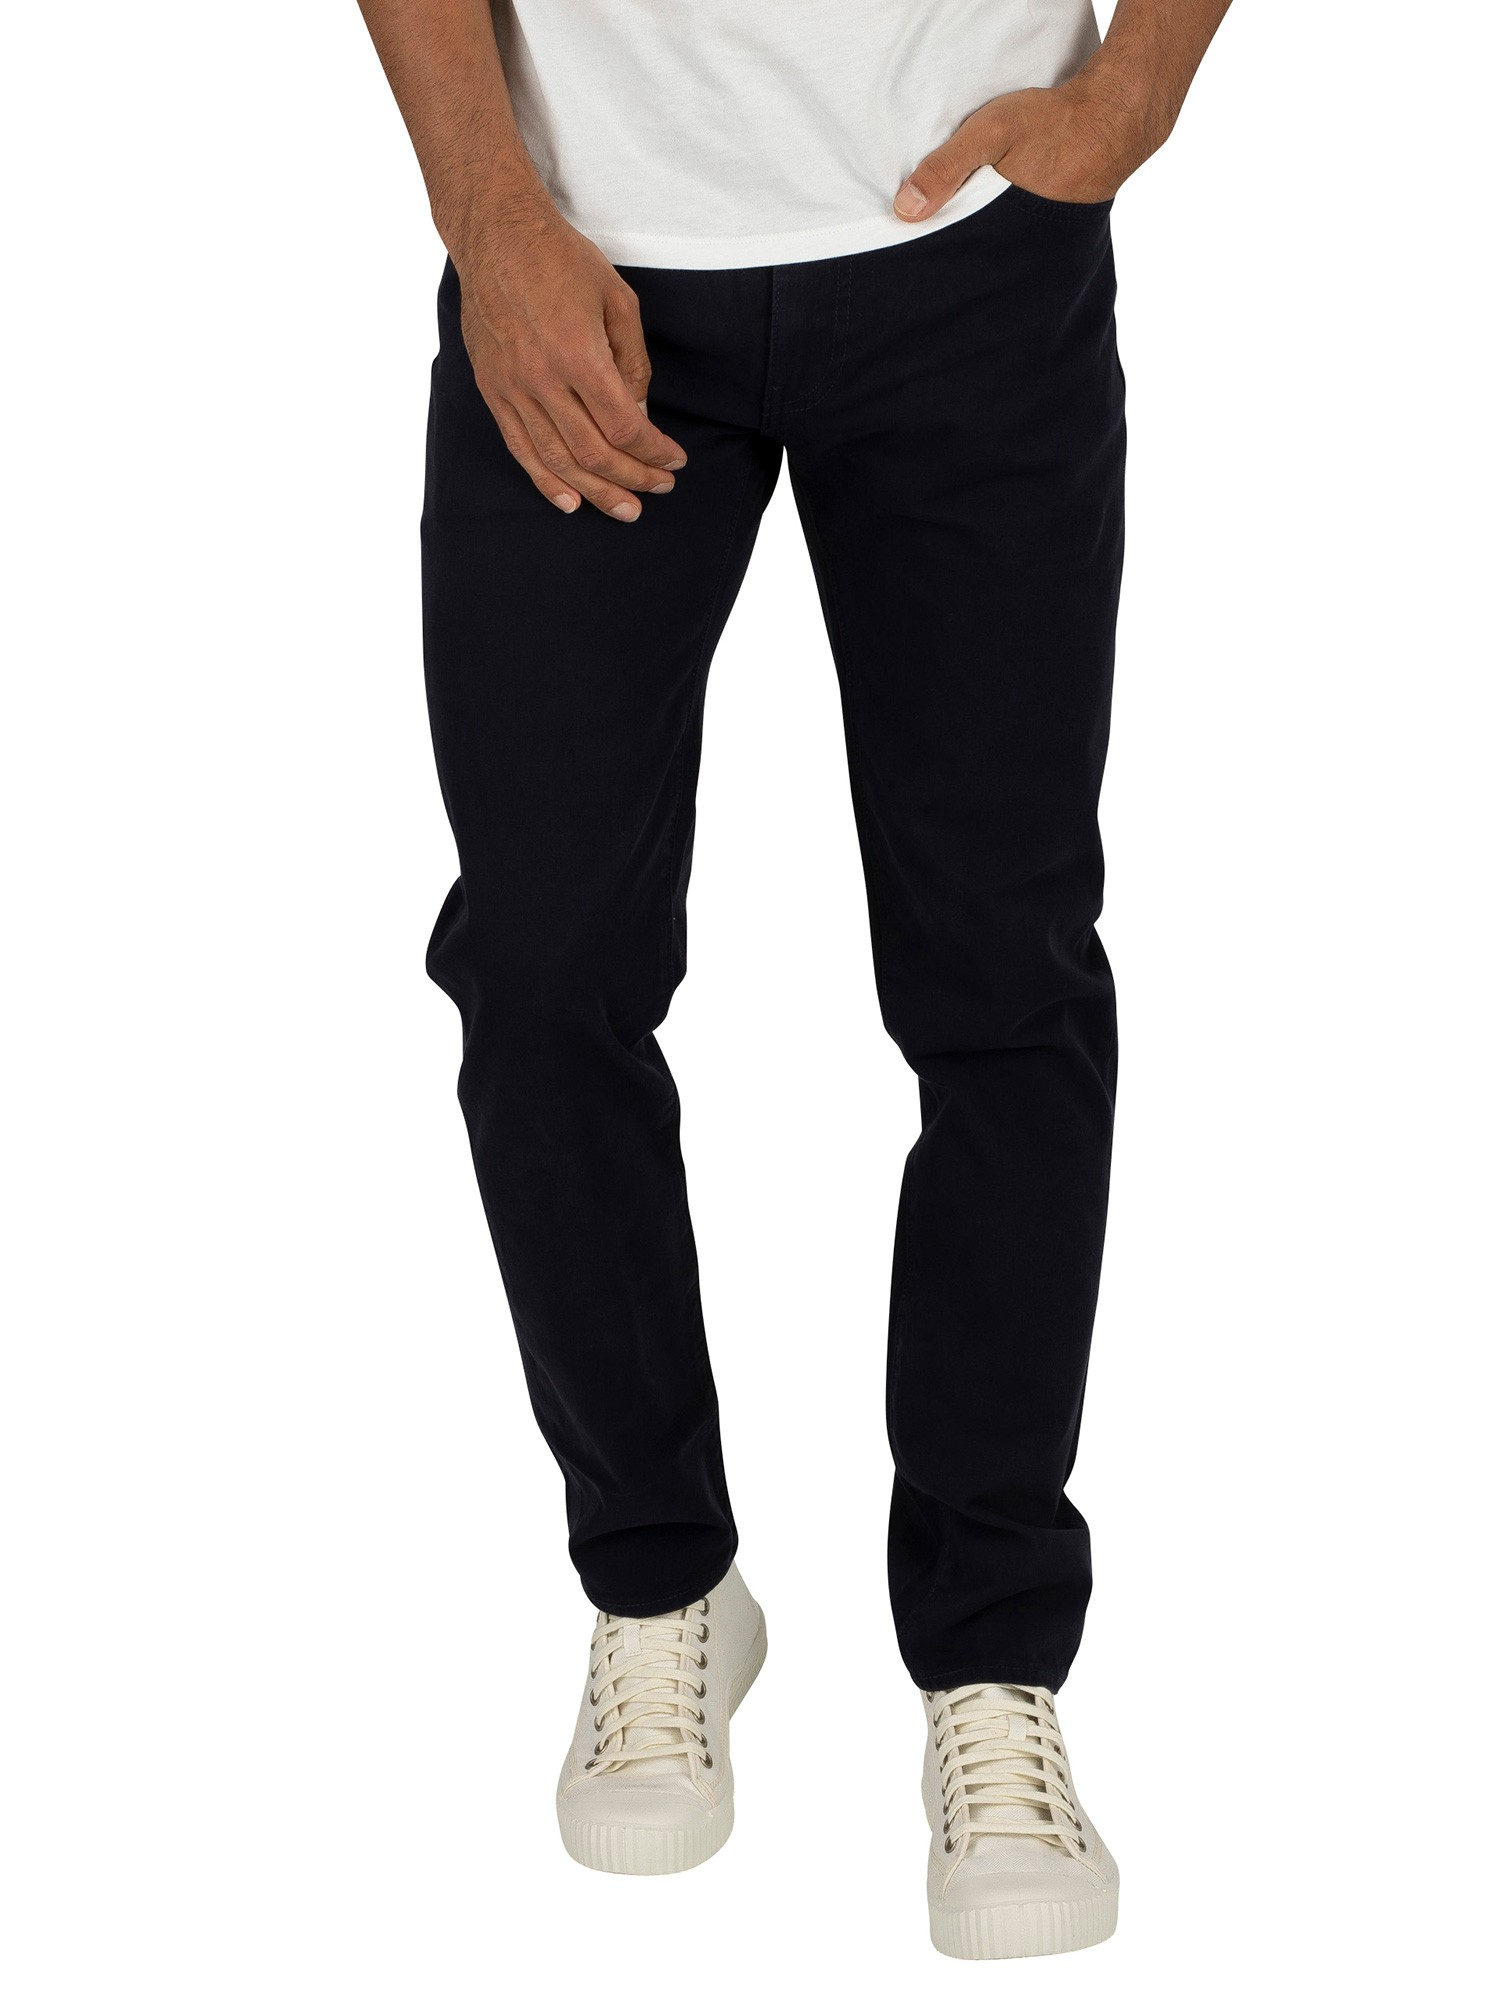 pas mal 60289 9c1f4 Levi's 511 Slim Fit Jeans - Nightwatch Blue